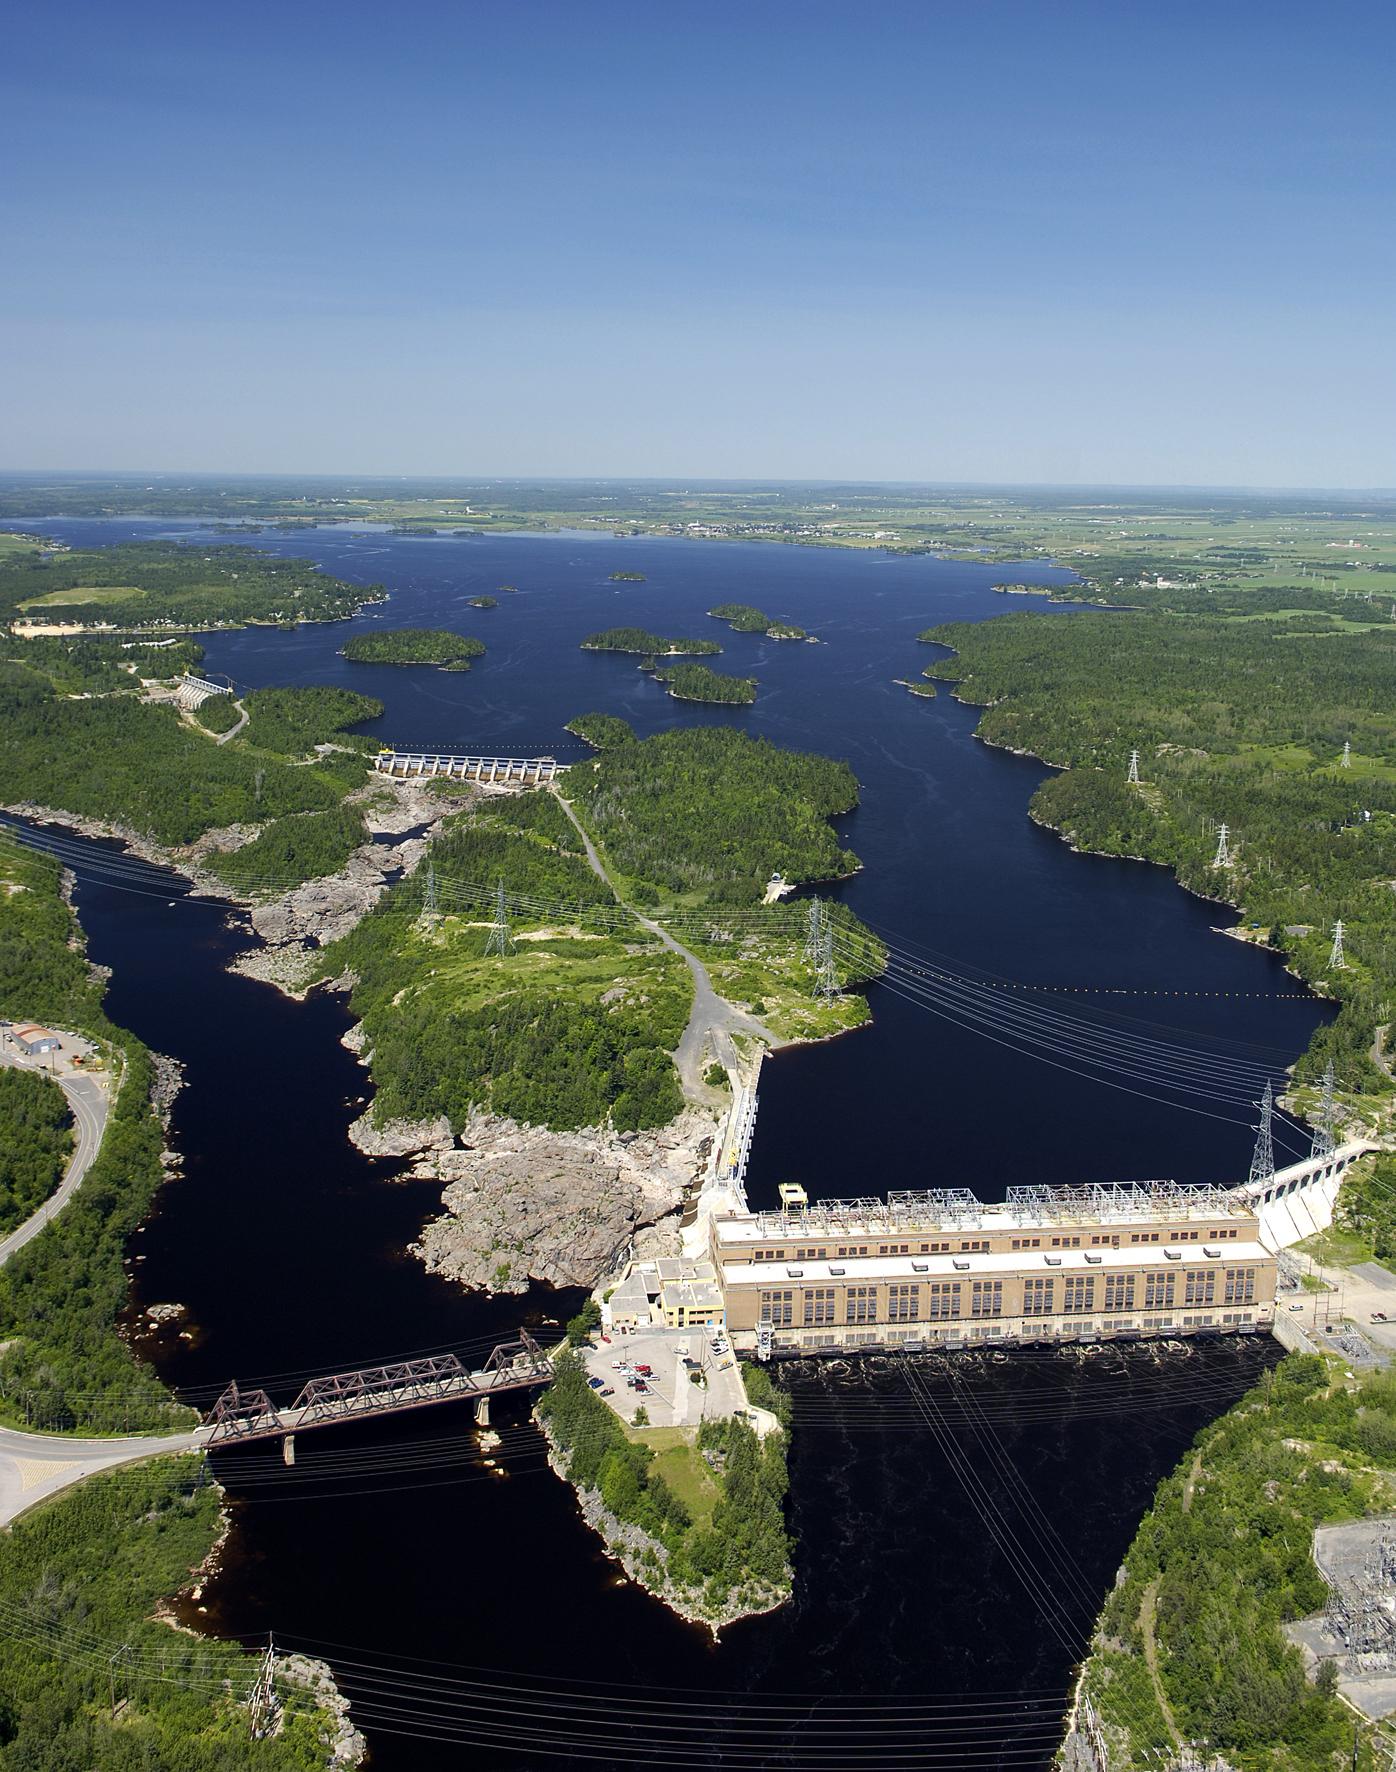 Rio Tinto – Shipshaw hydropower plant